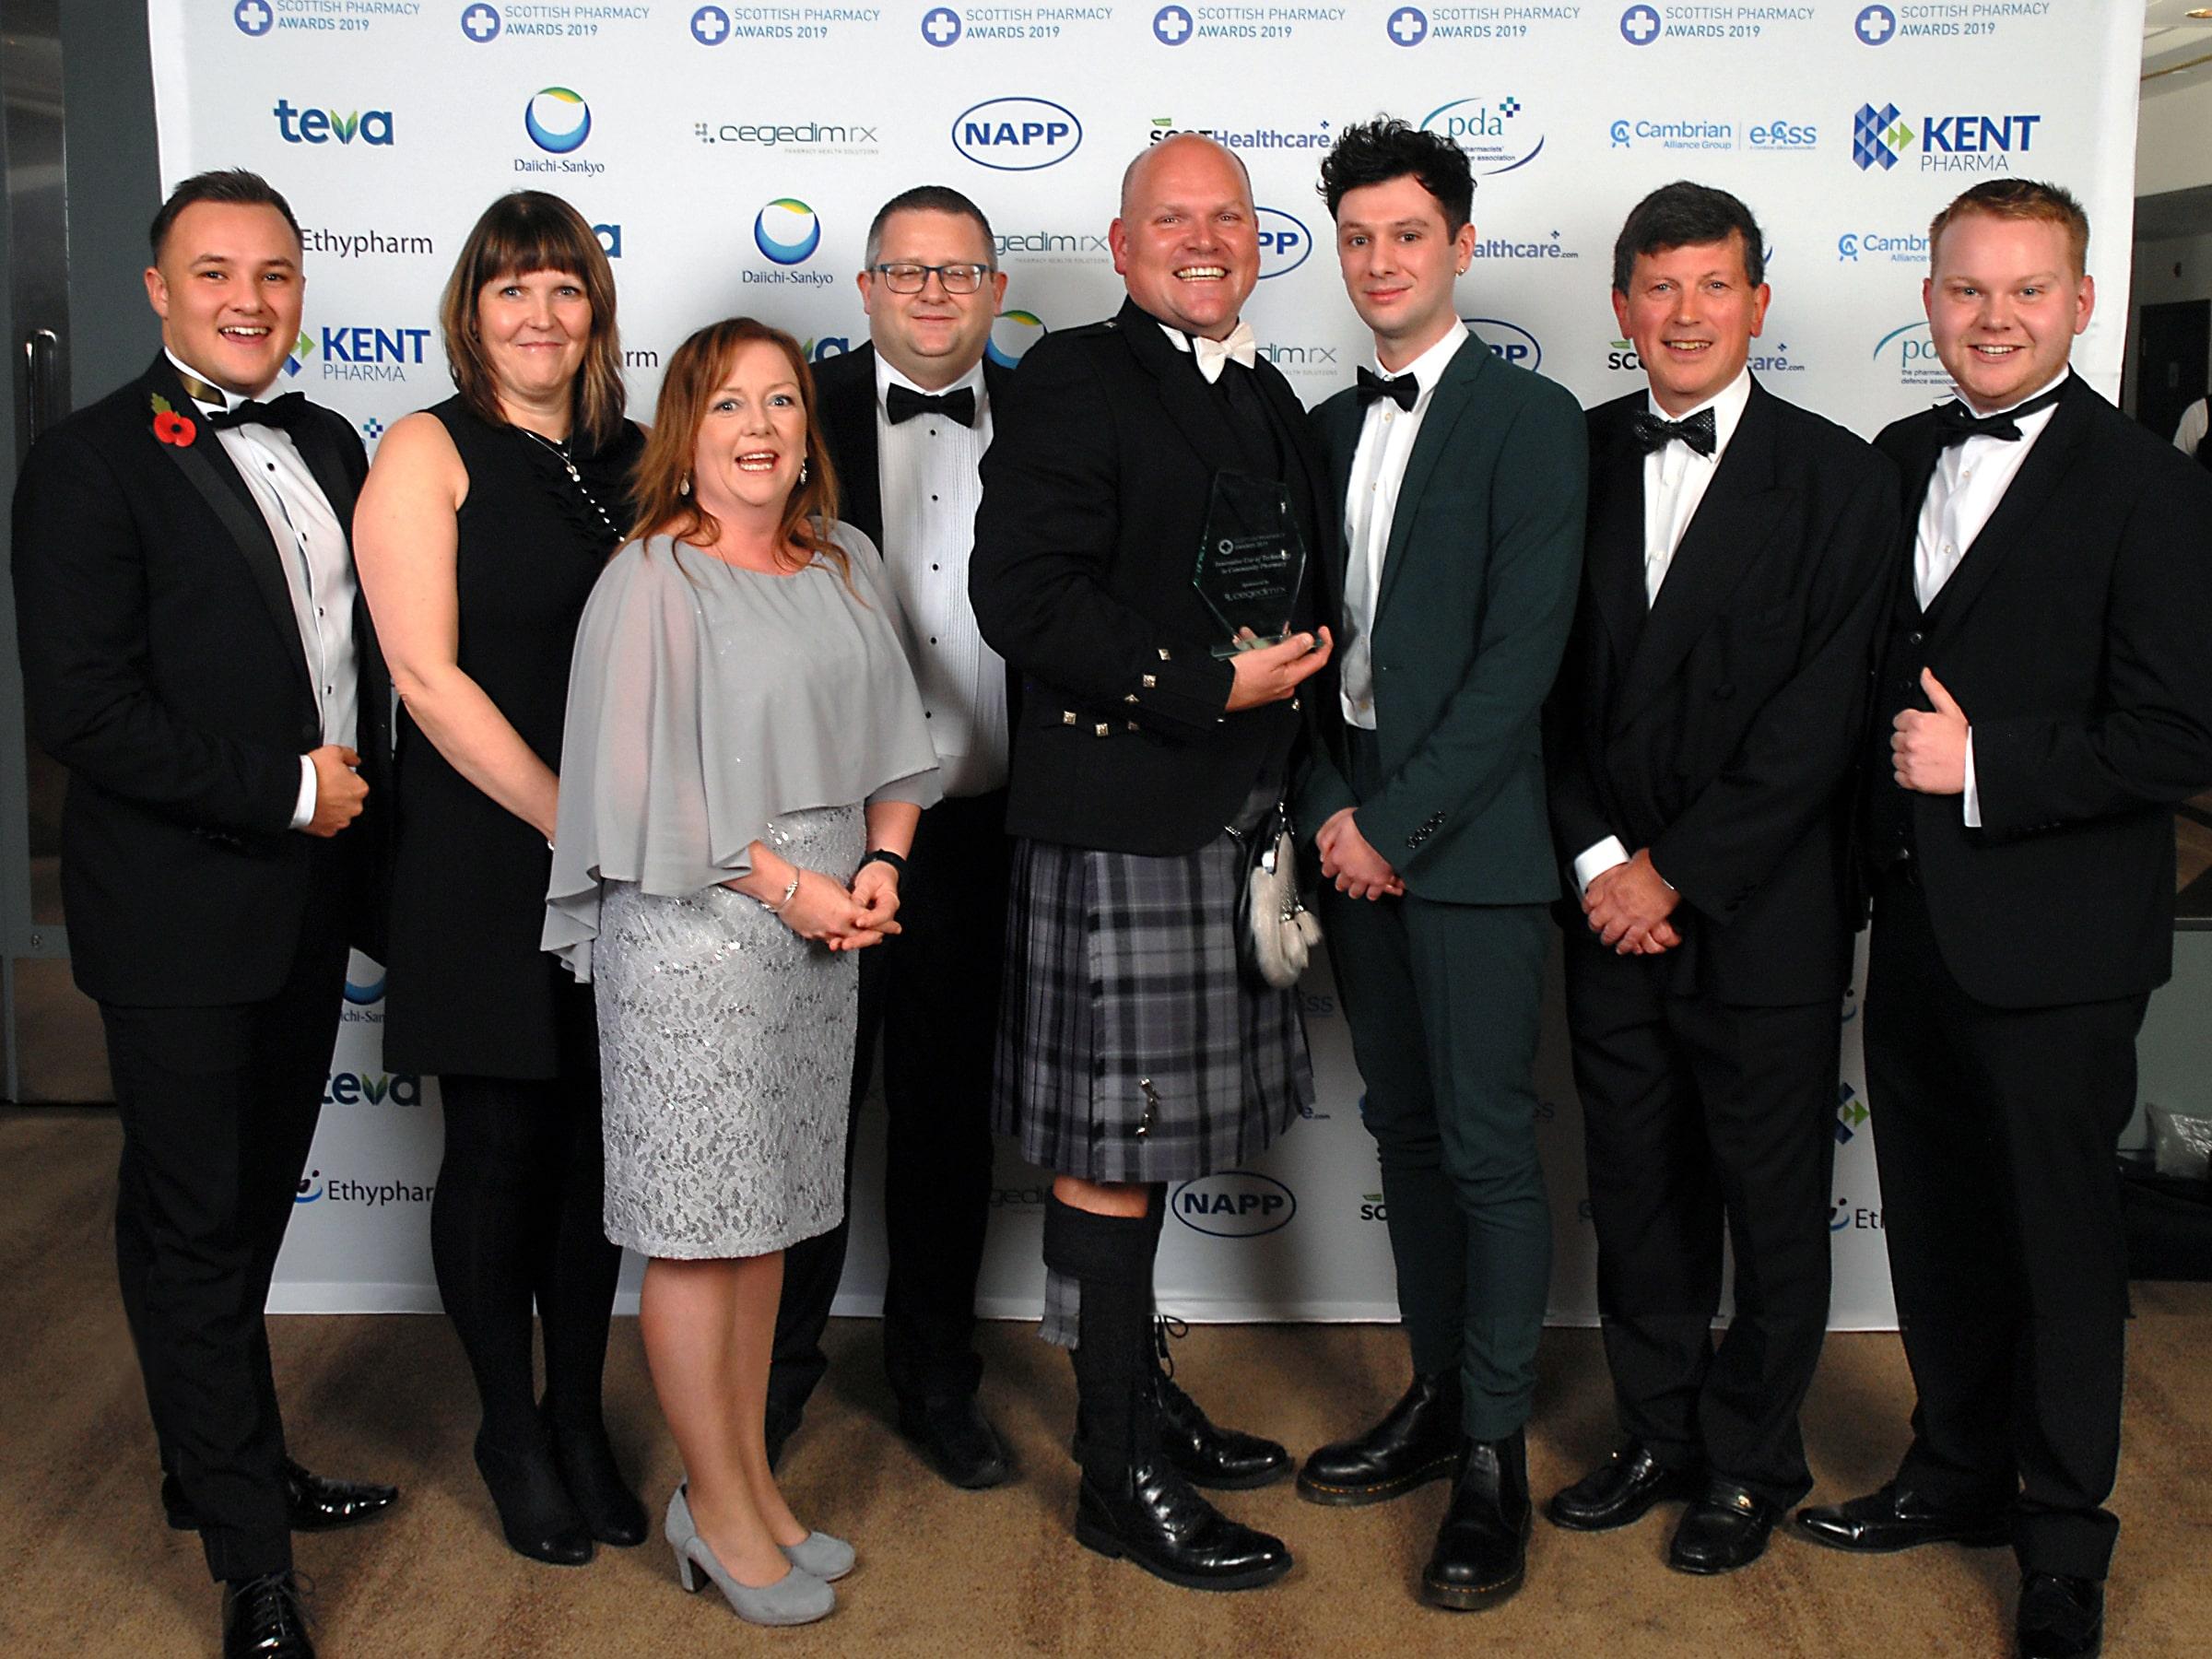 Innovative Use of Technology - Scottish Pharmacy Awards